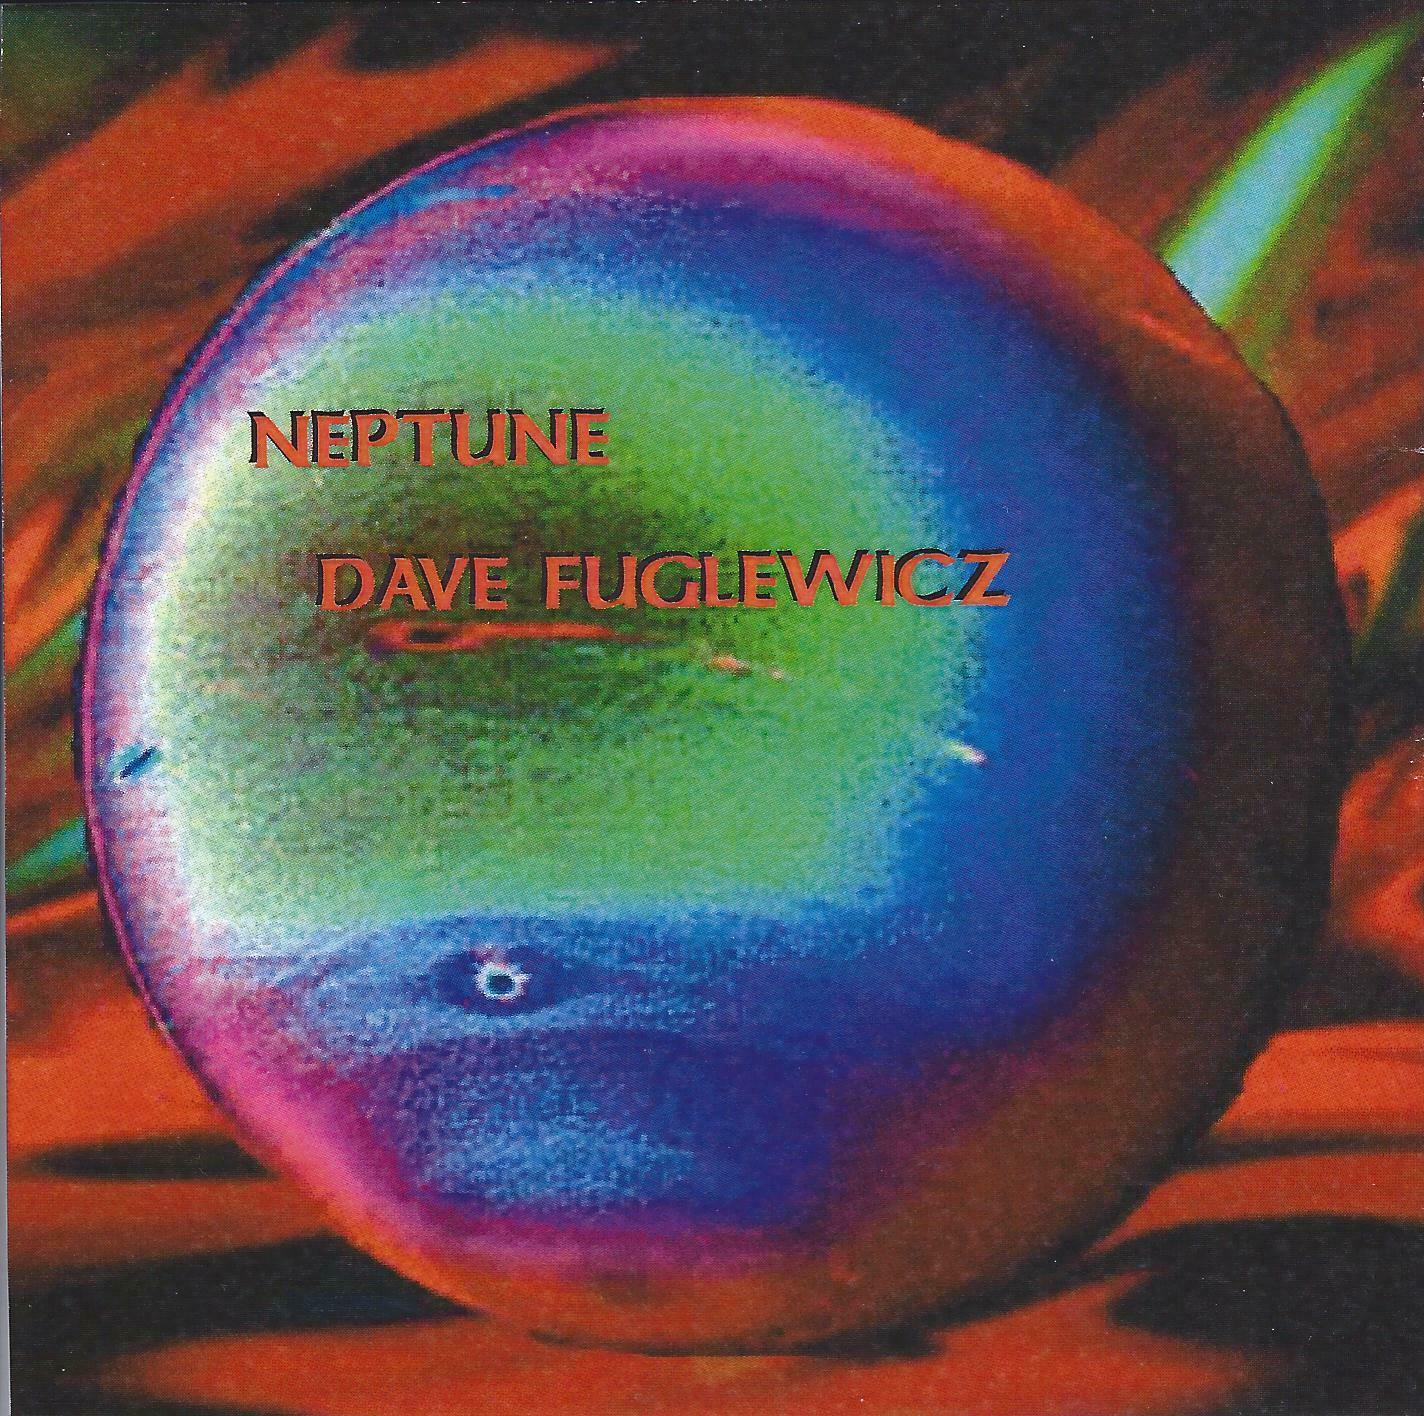 Neptune Great Dark Spot a Great Dark Spot on The